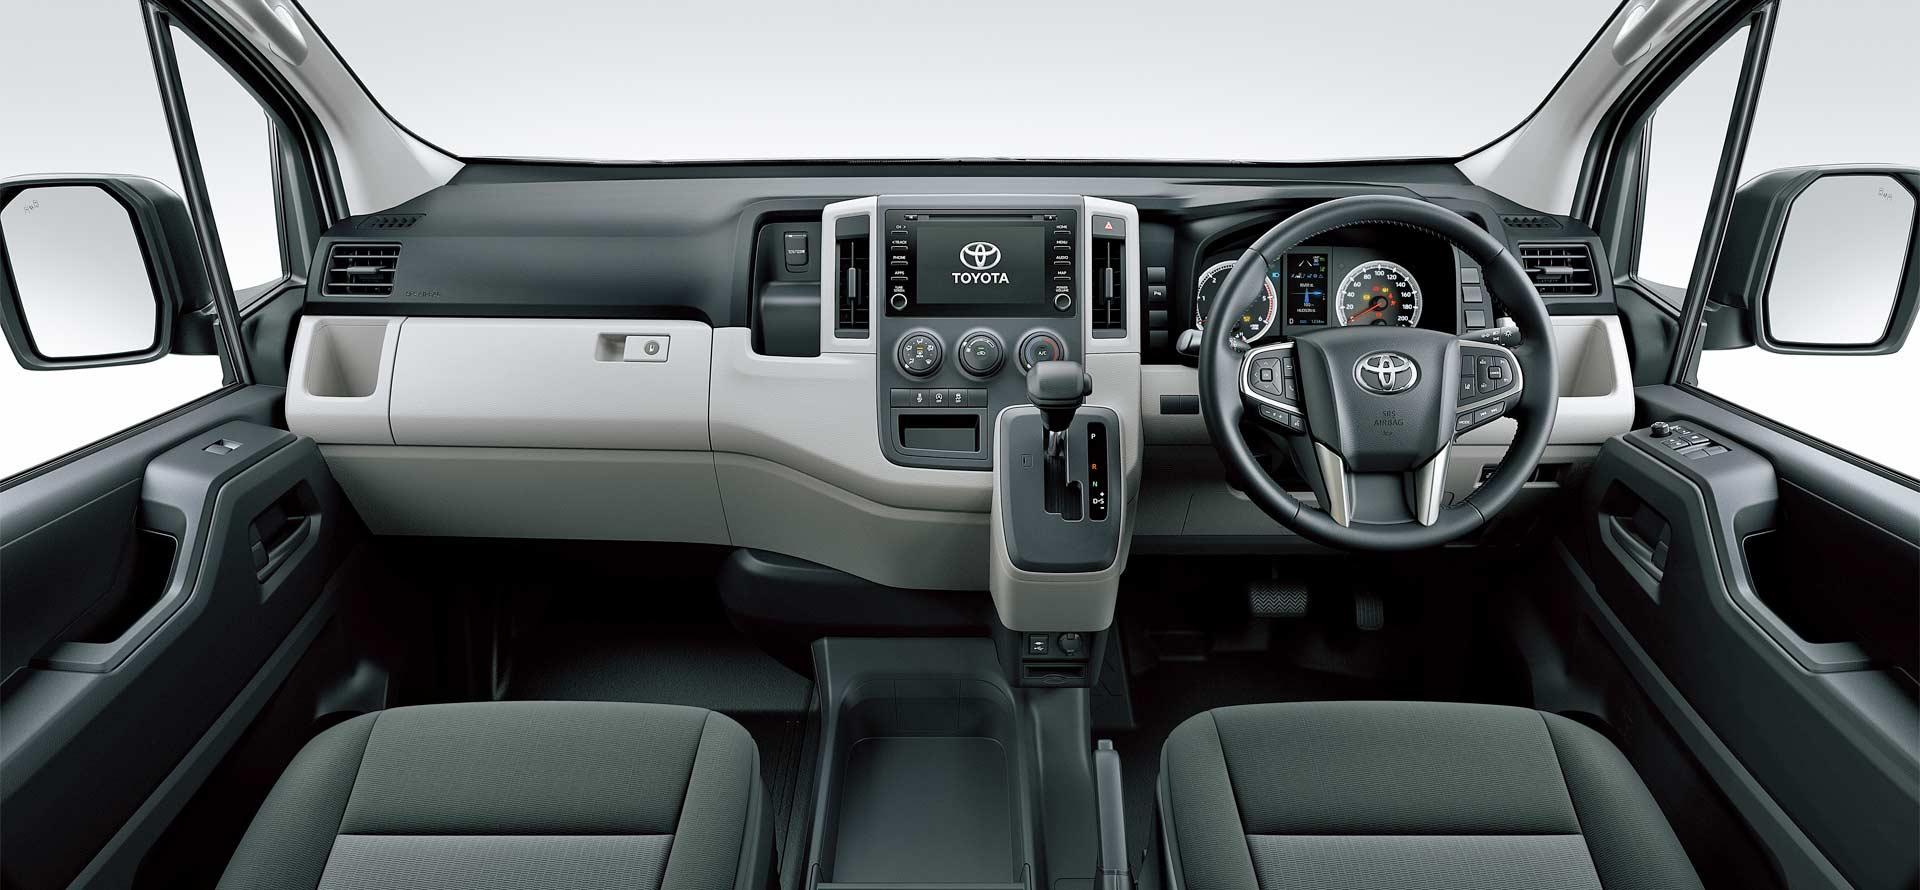 2019-6th-generation-Toyota-Hiace-Interior_2